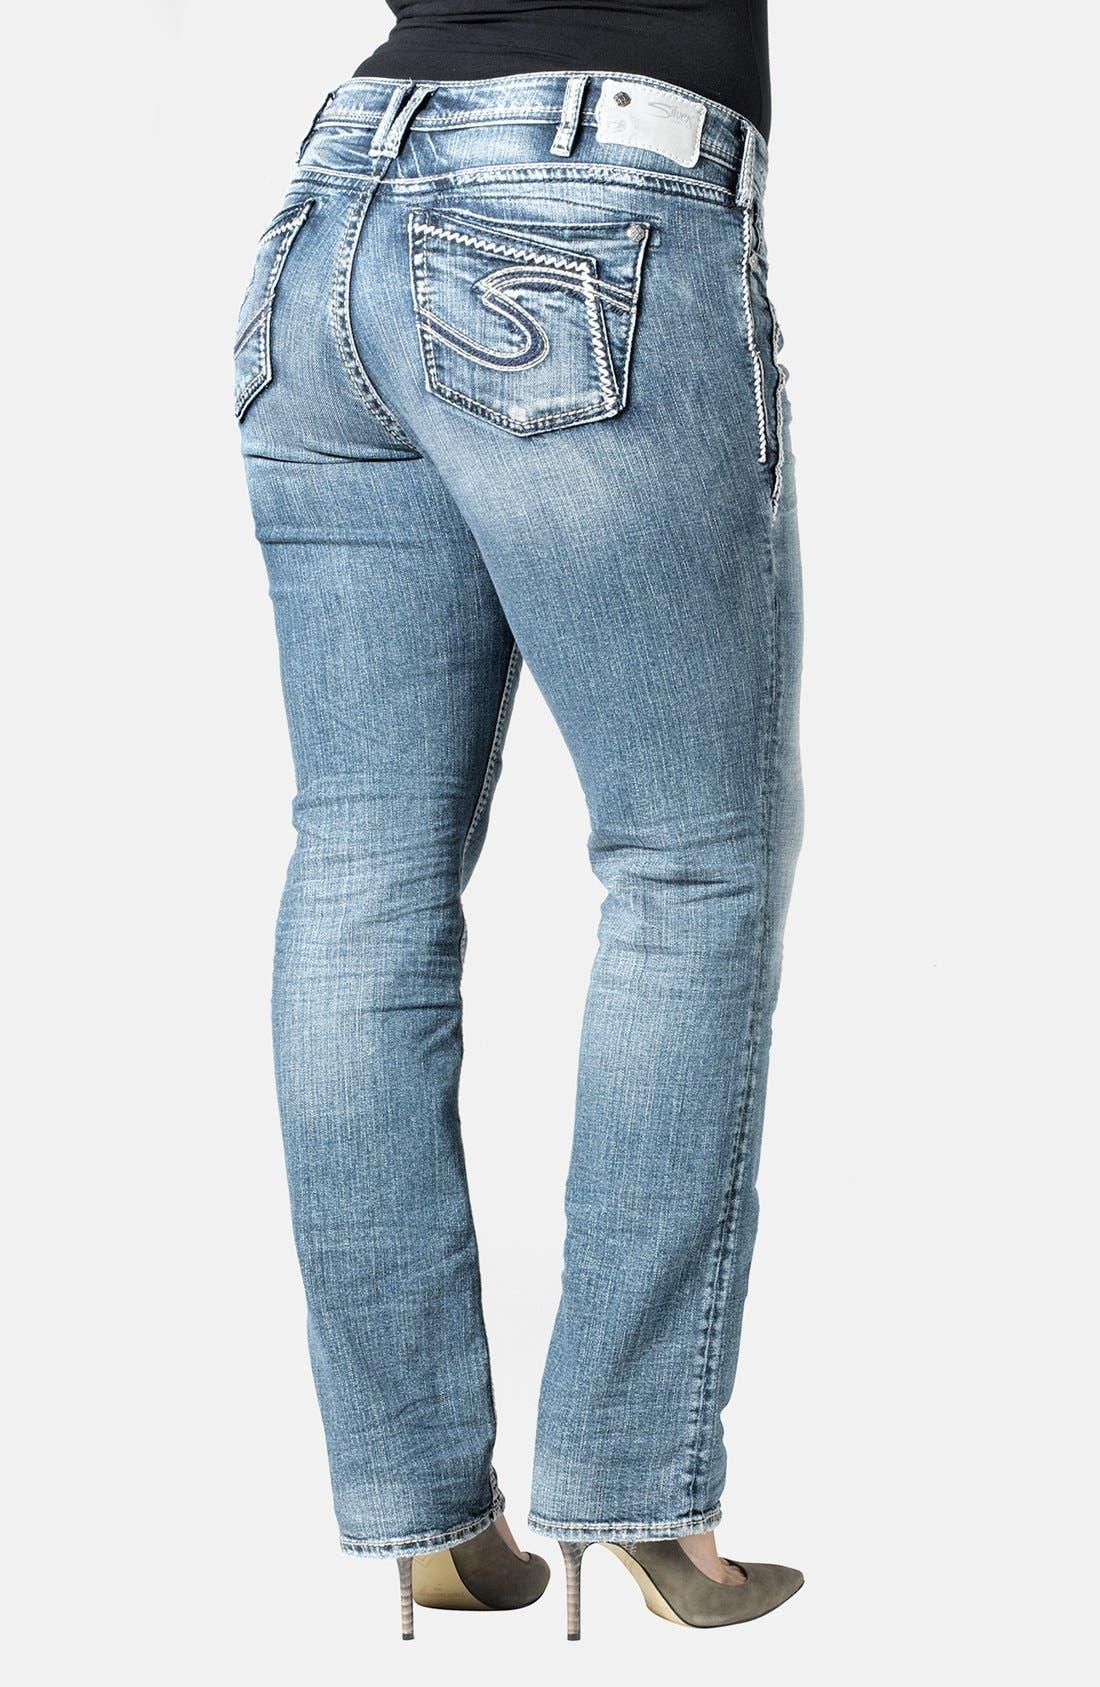 Alternate Image 2  - Silver Jeans Co. 'Aiko' Straight Leg Jeans (Indigo) (Plus Size)